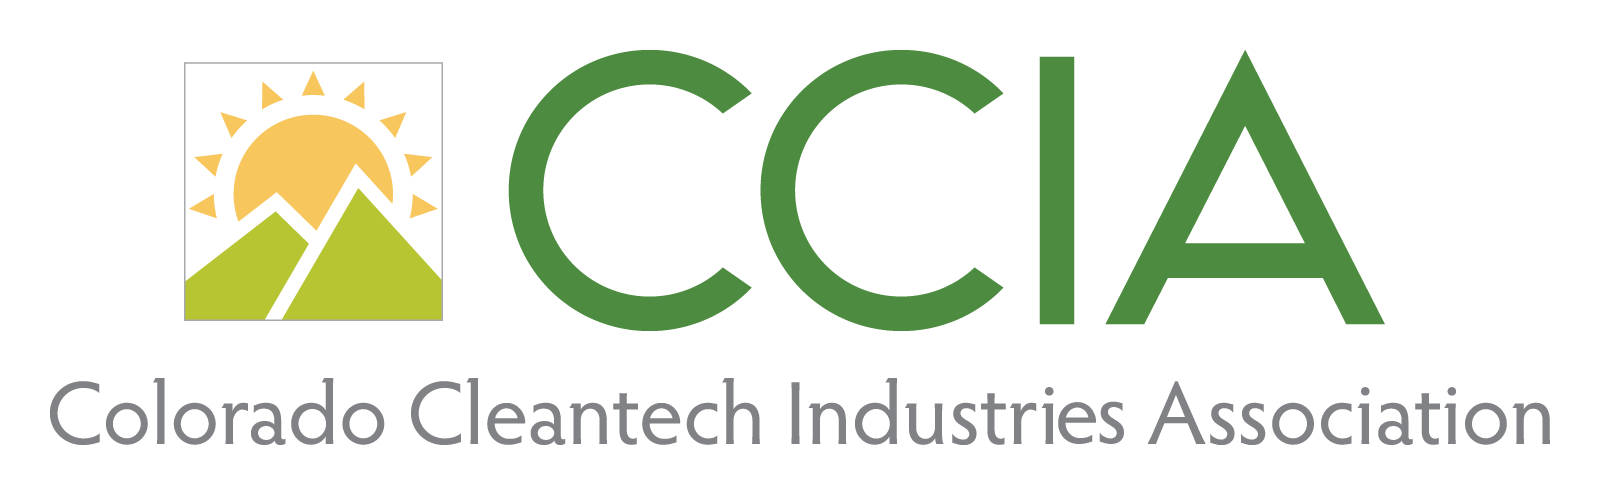 Colorado Cleantech Industry Association